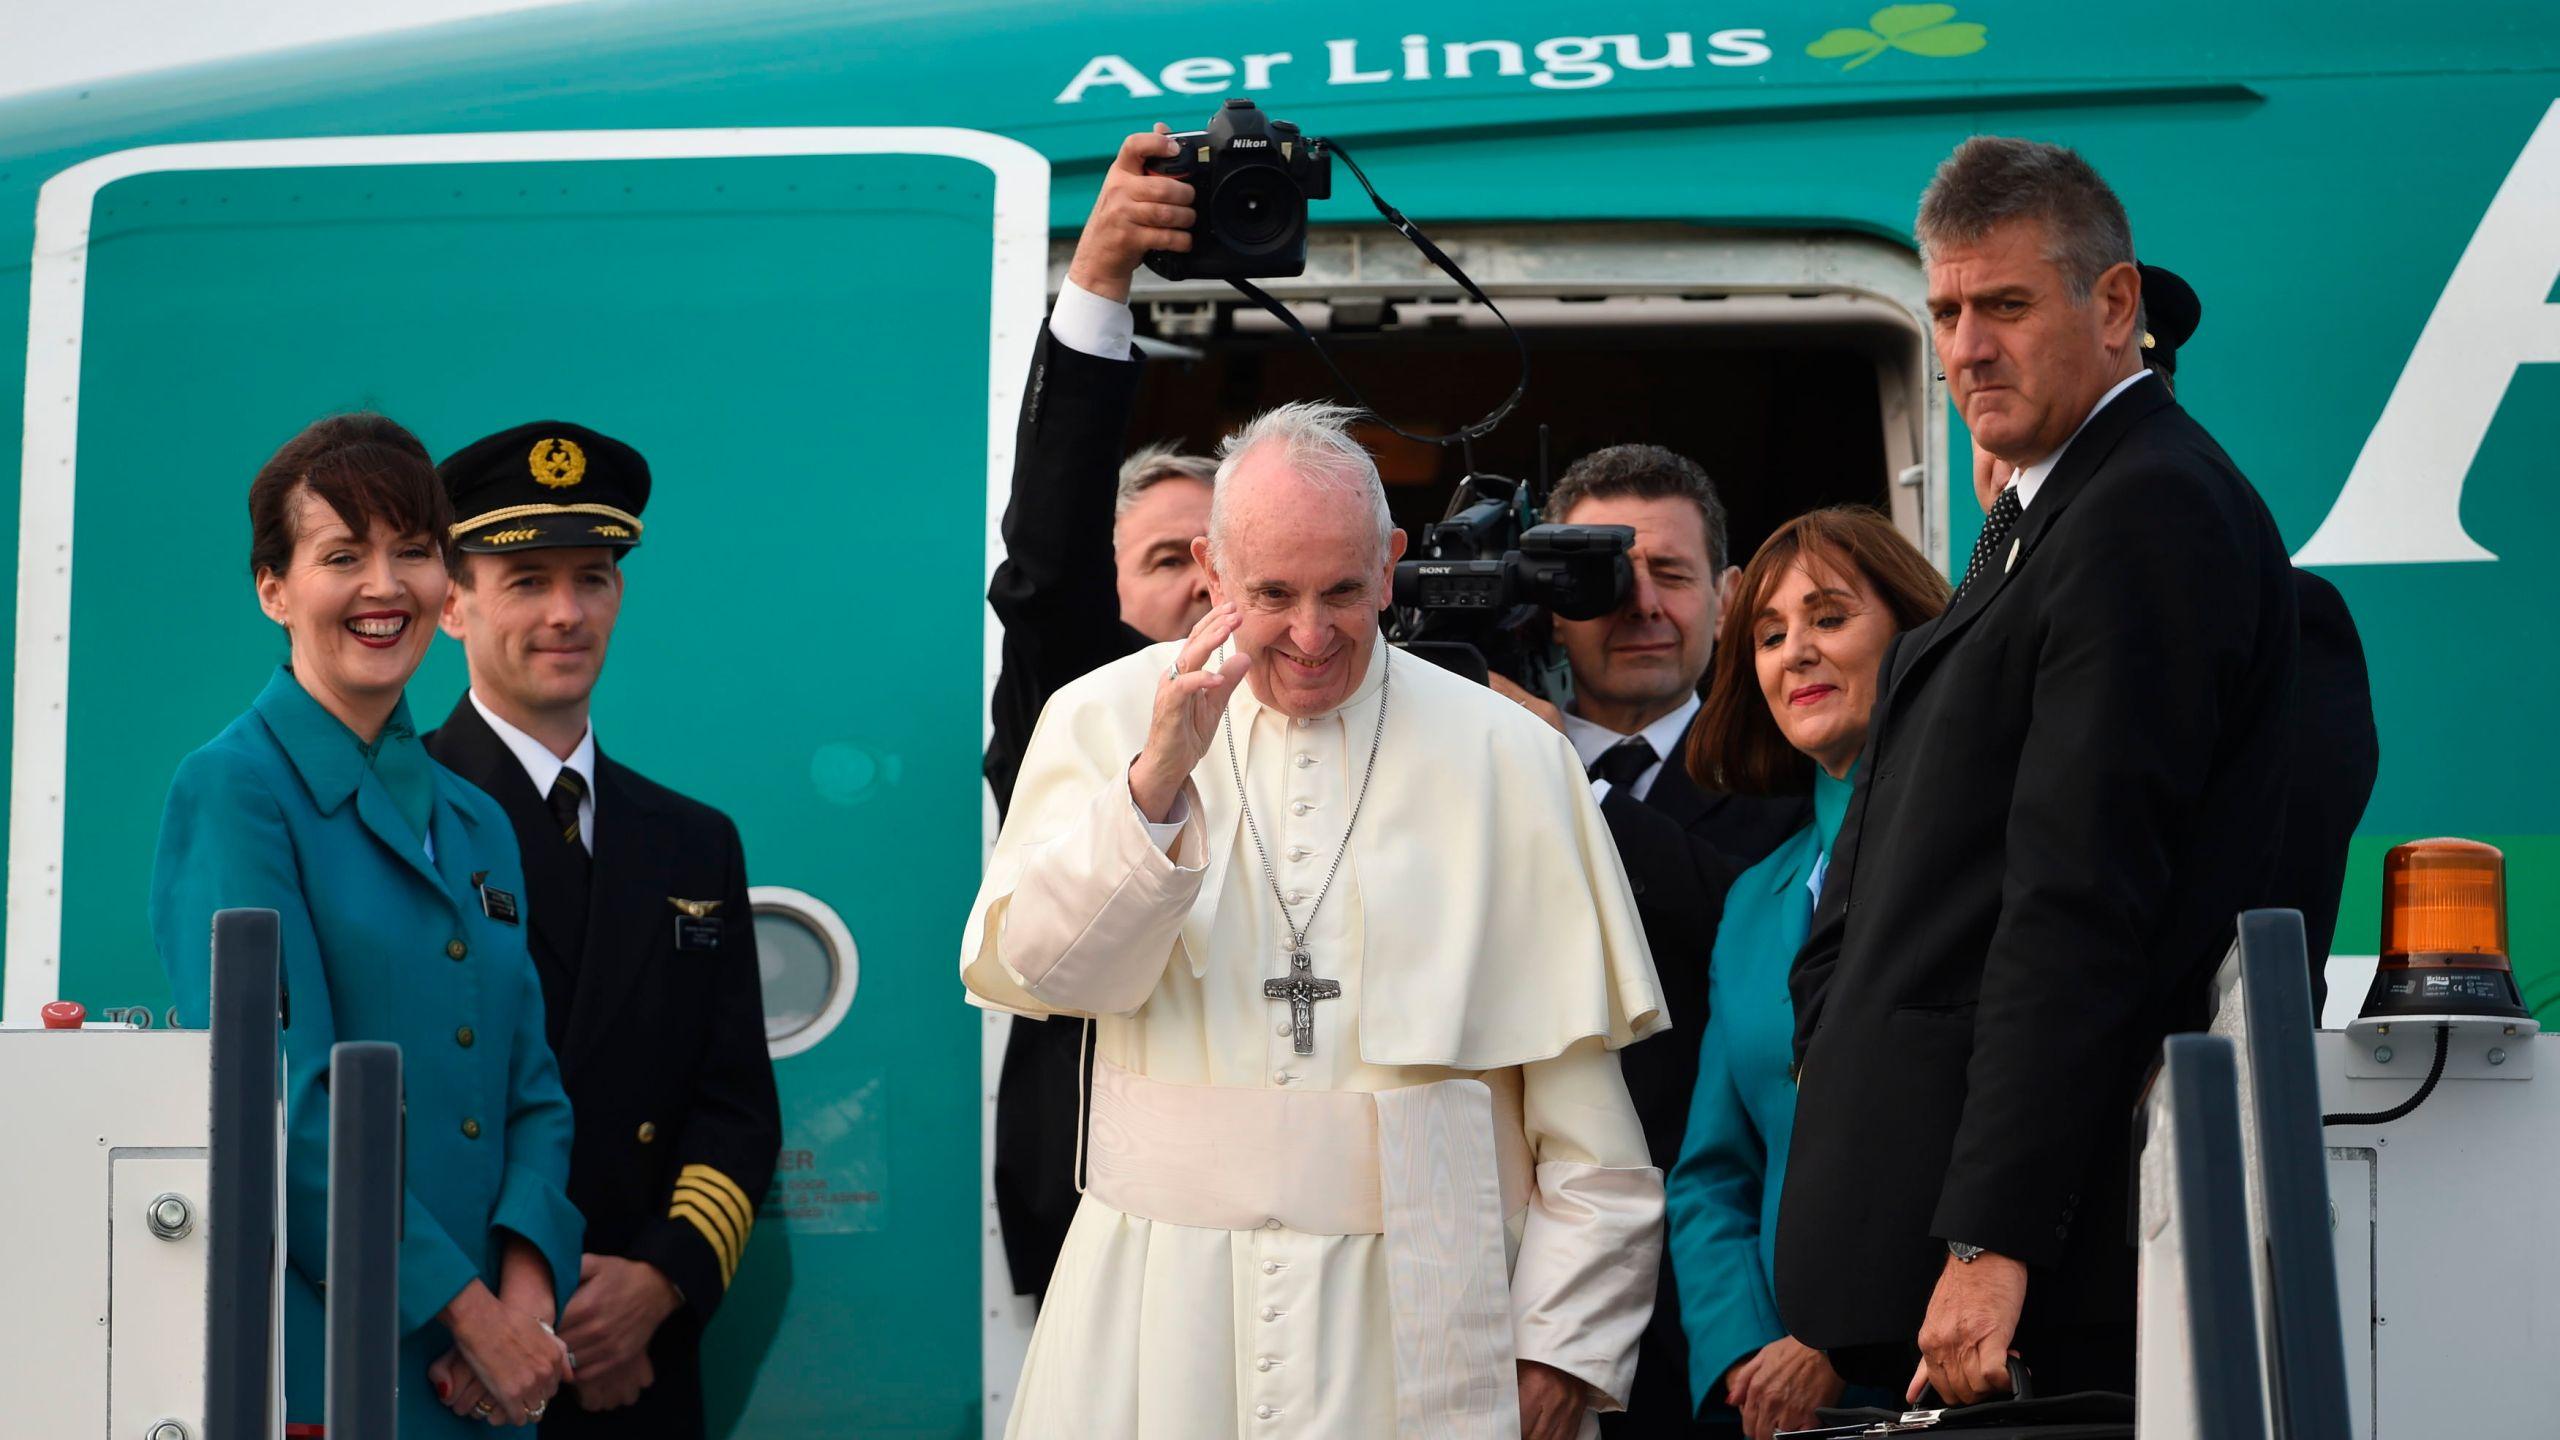 Ireland_Pope_53784-159532.jpg09750013